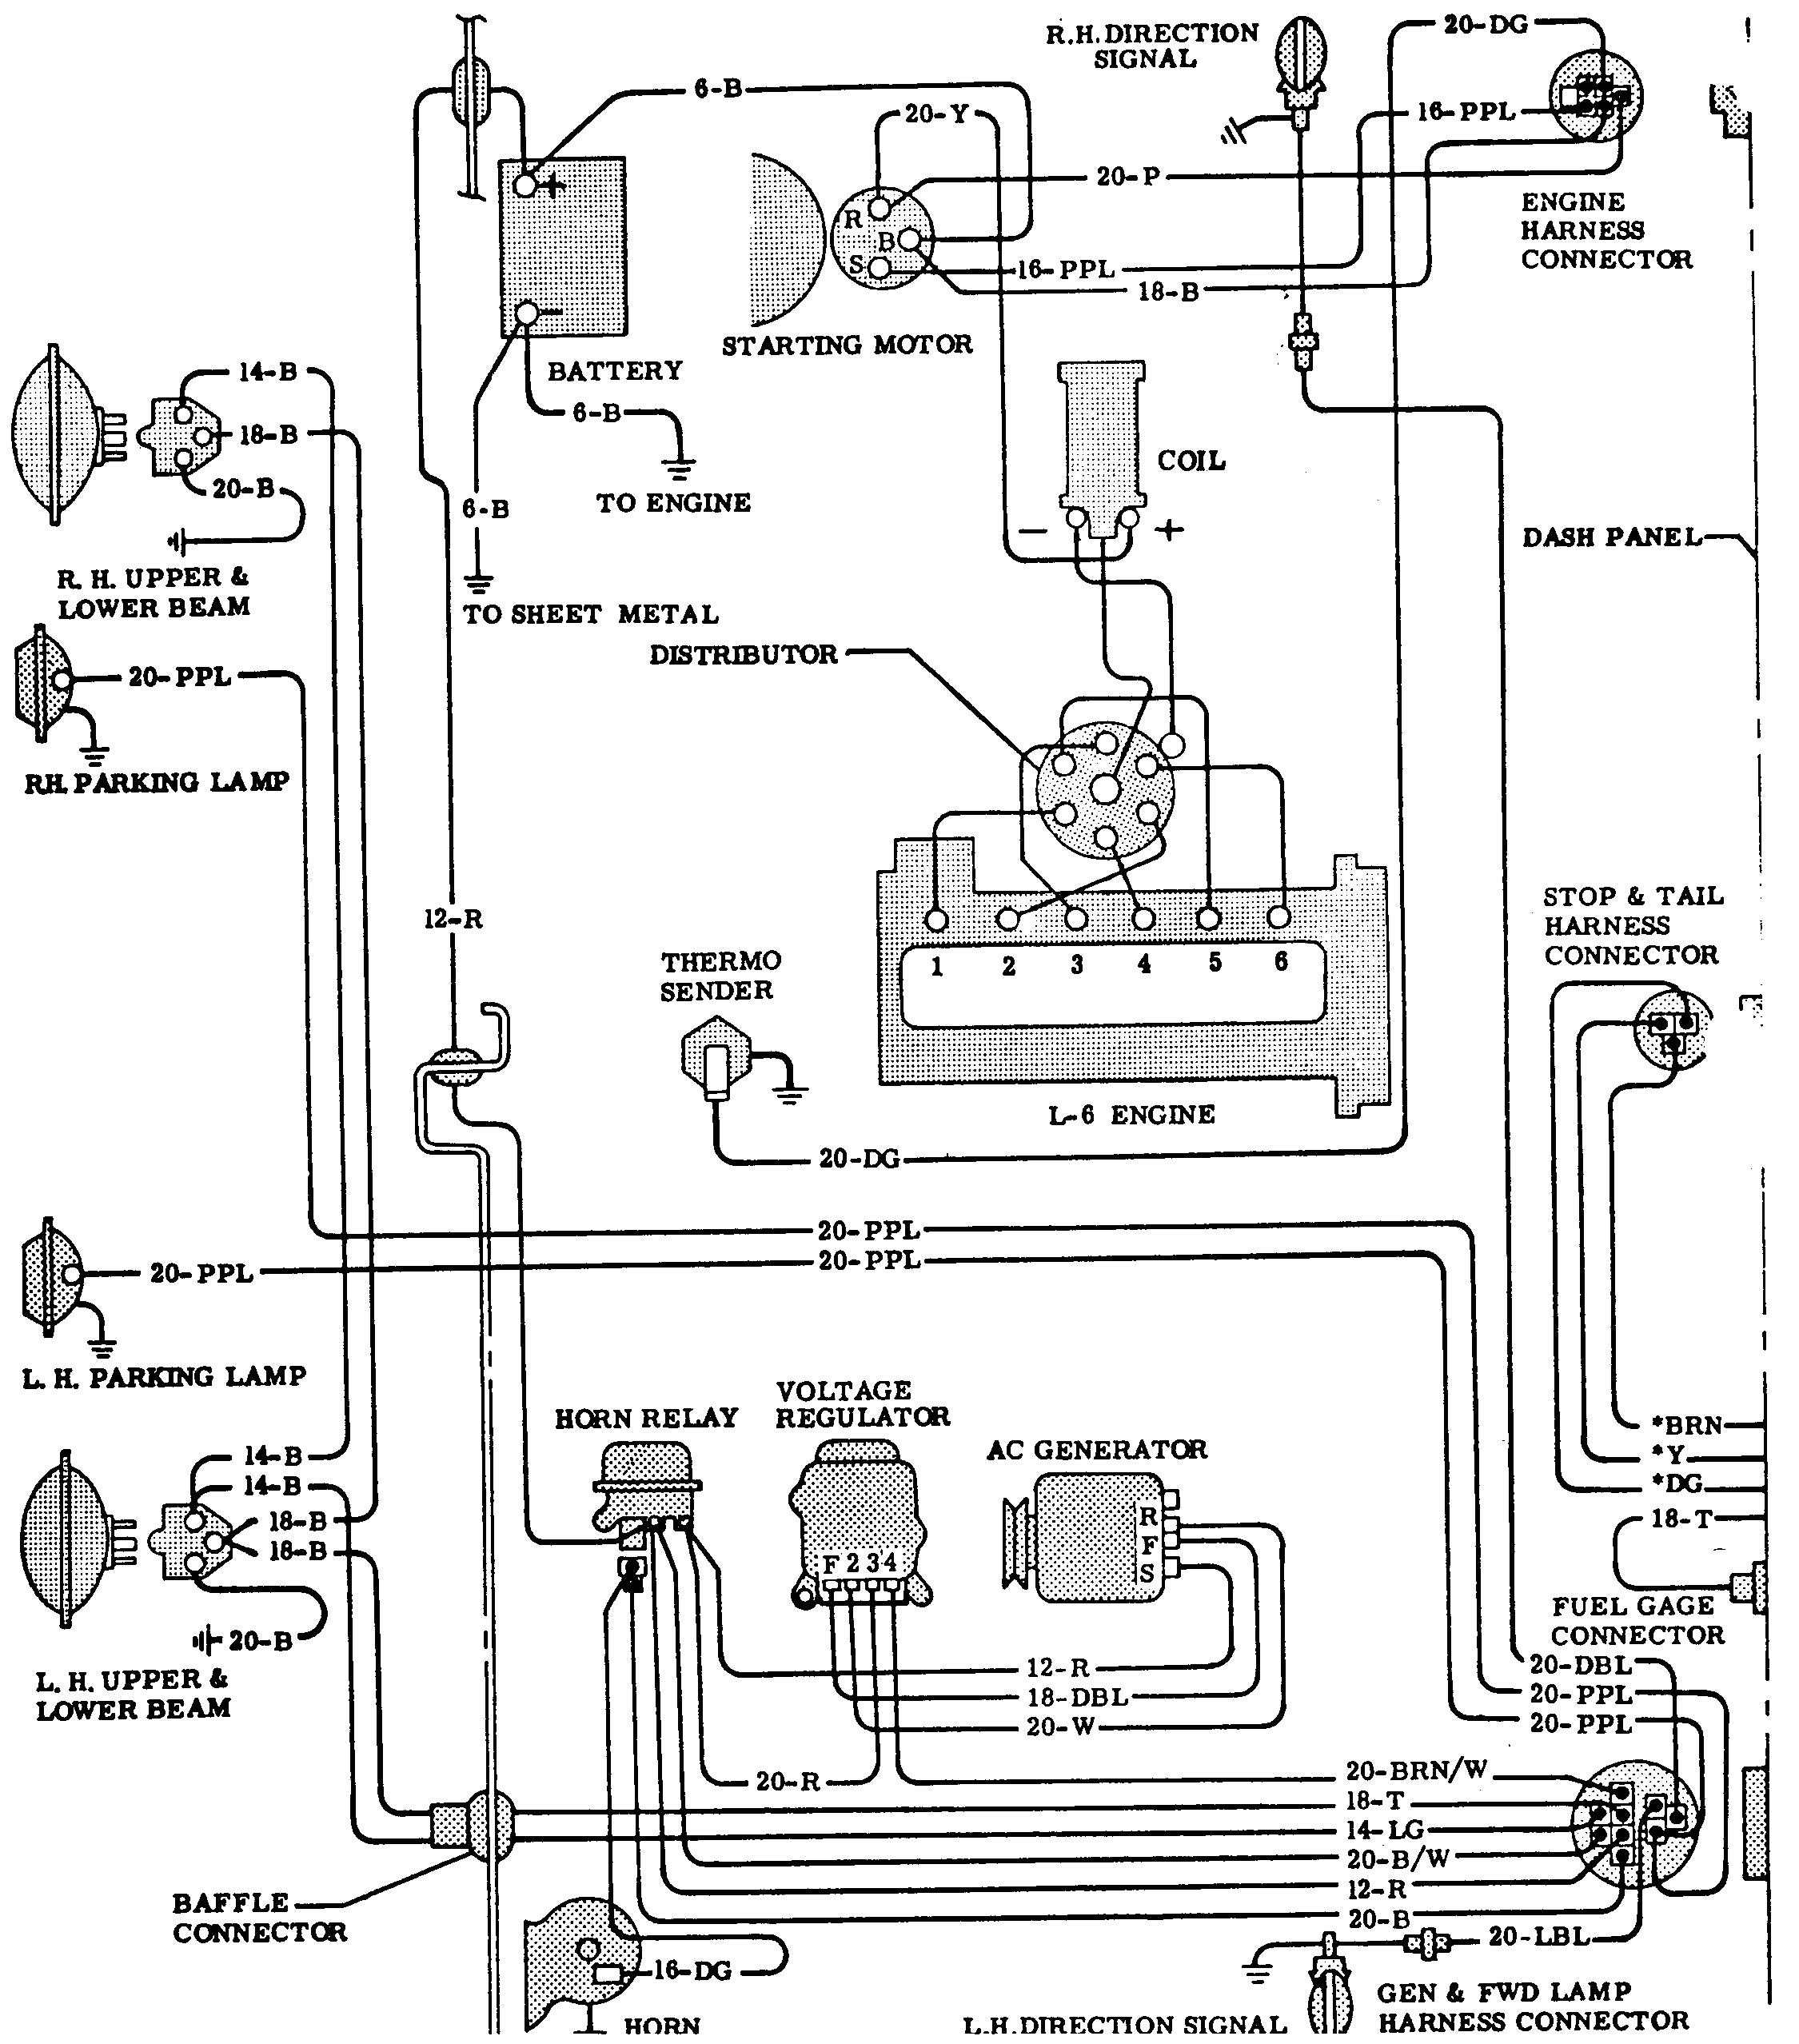 66 6 cylinder gm wiring harness diagram wiring diagram expert 66 gm wiring harness diagram wiring